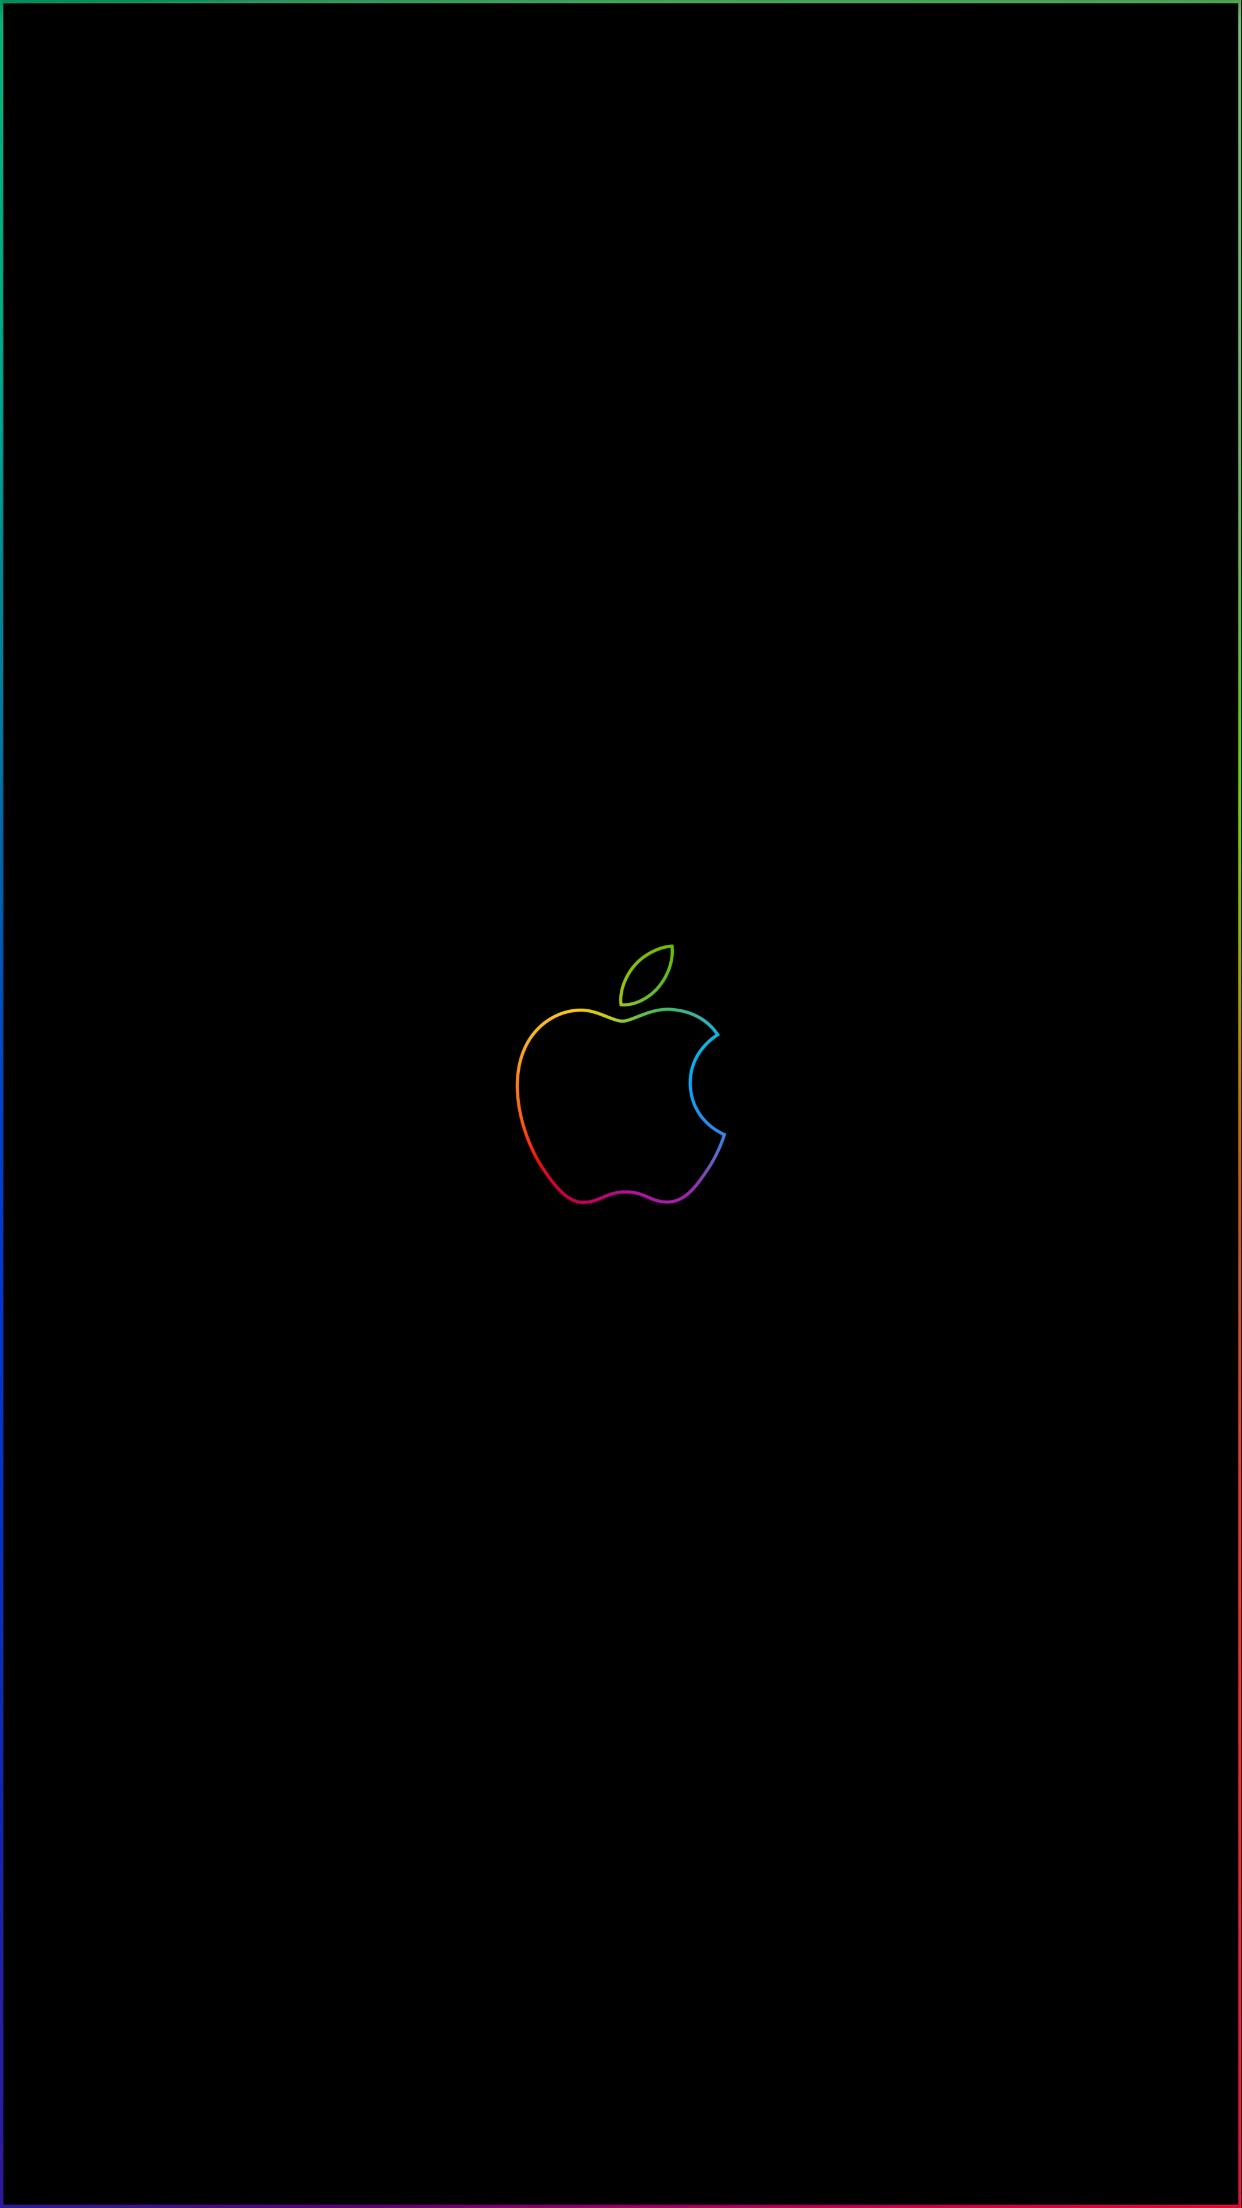 Rainbow border apple logo iPhone wallpapers Imgur links iphone 1242x2208